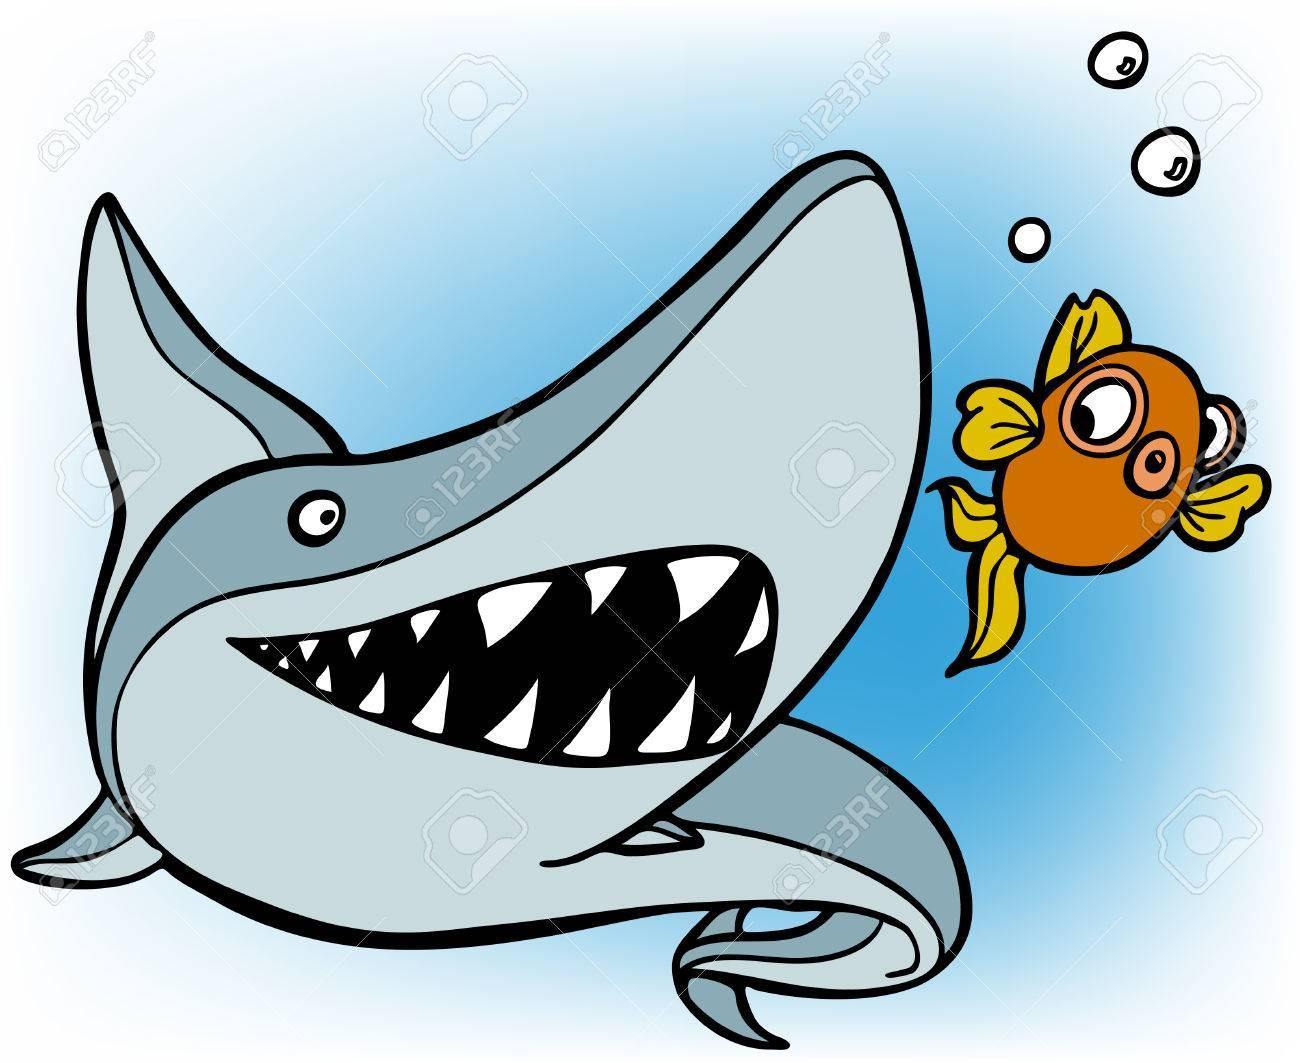 1300x1063 Shark Chasing Goldfish Royalty Free Cliparts, Vectors, And Stock